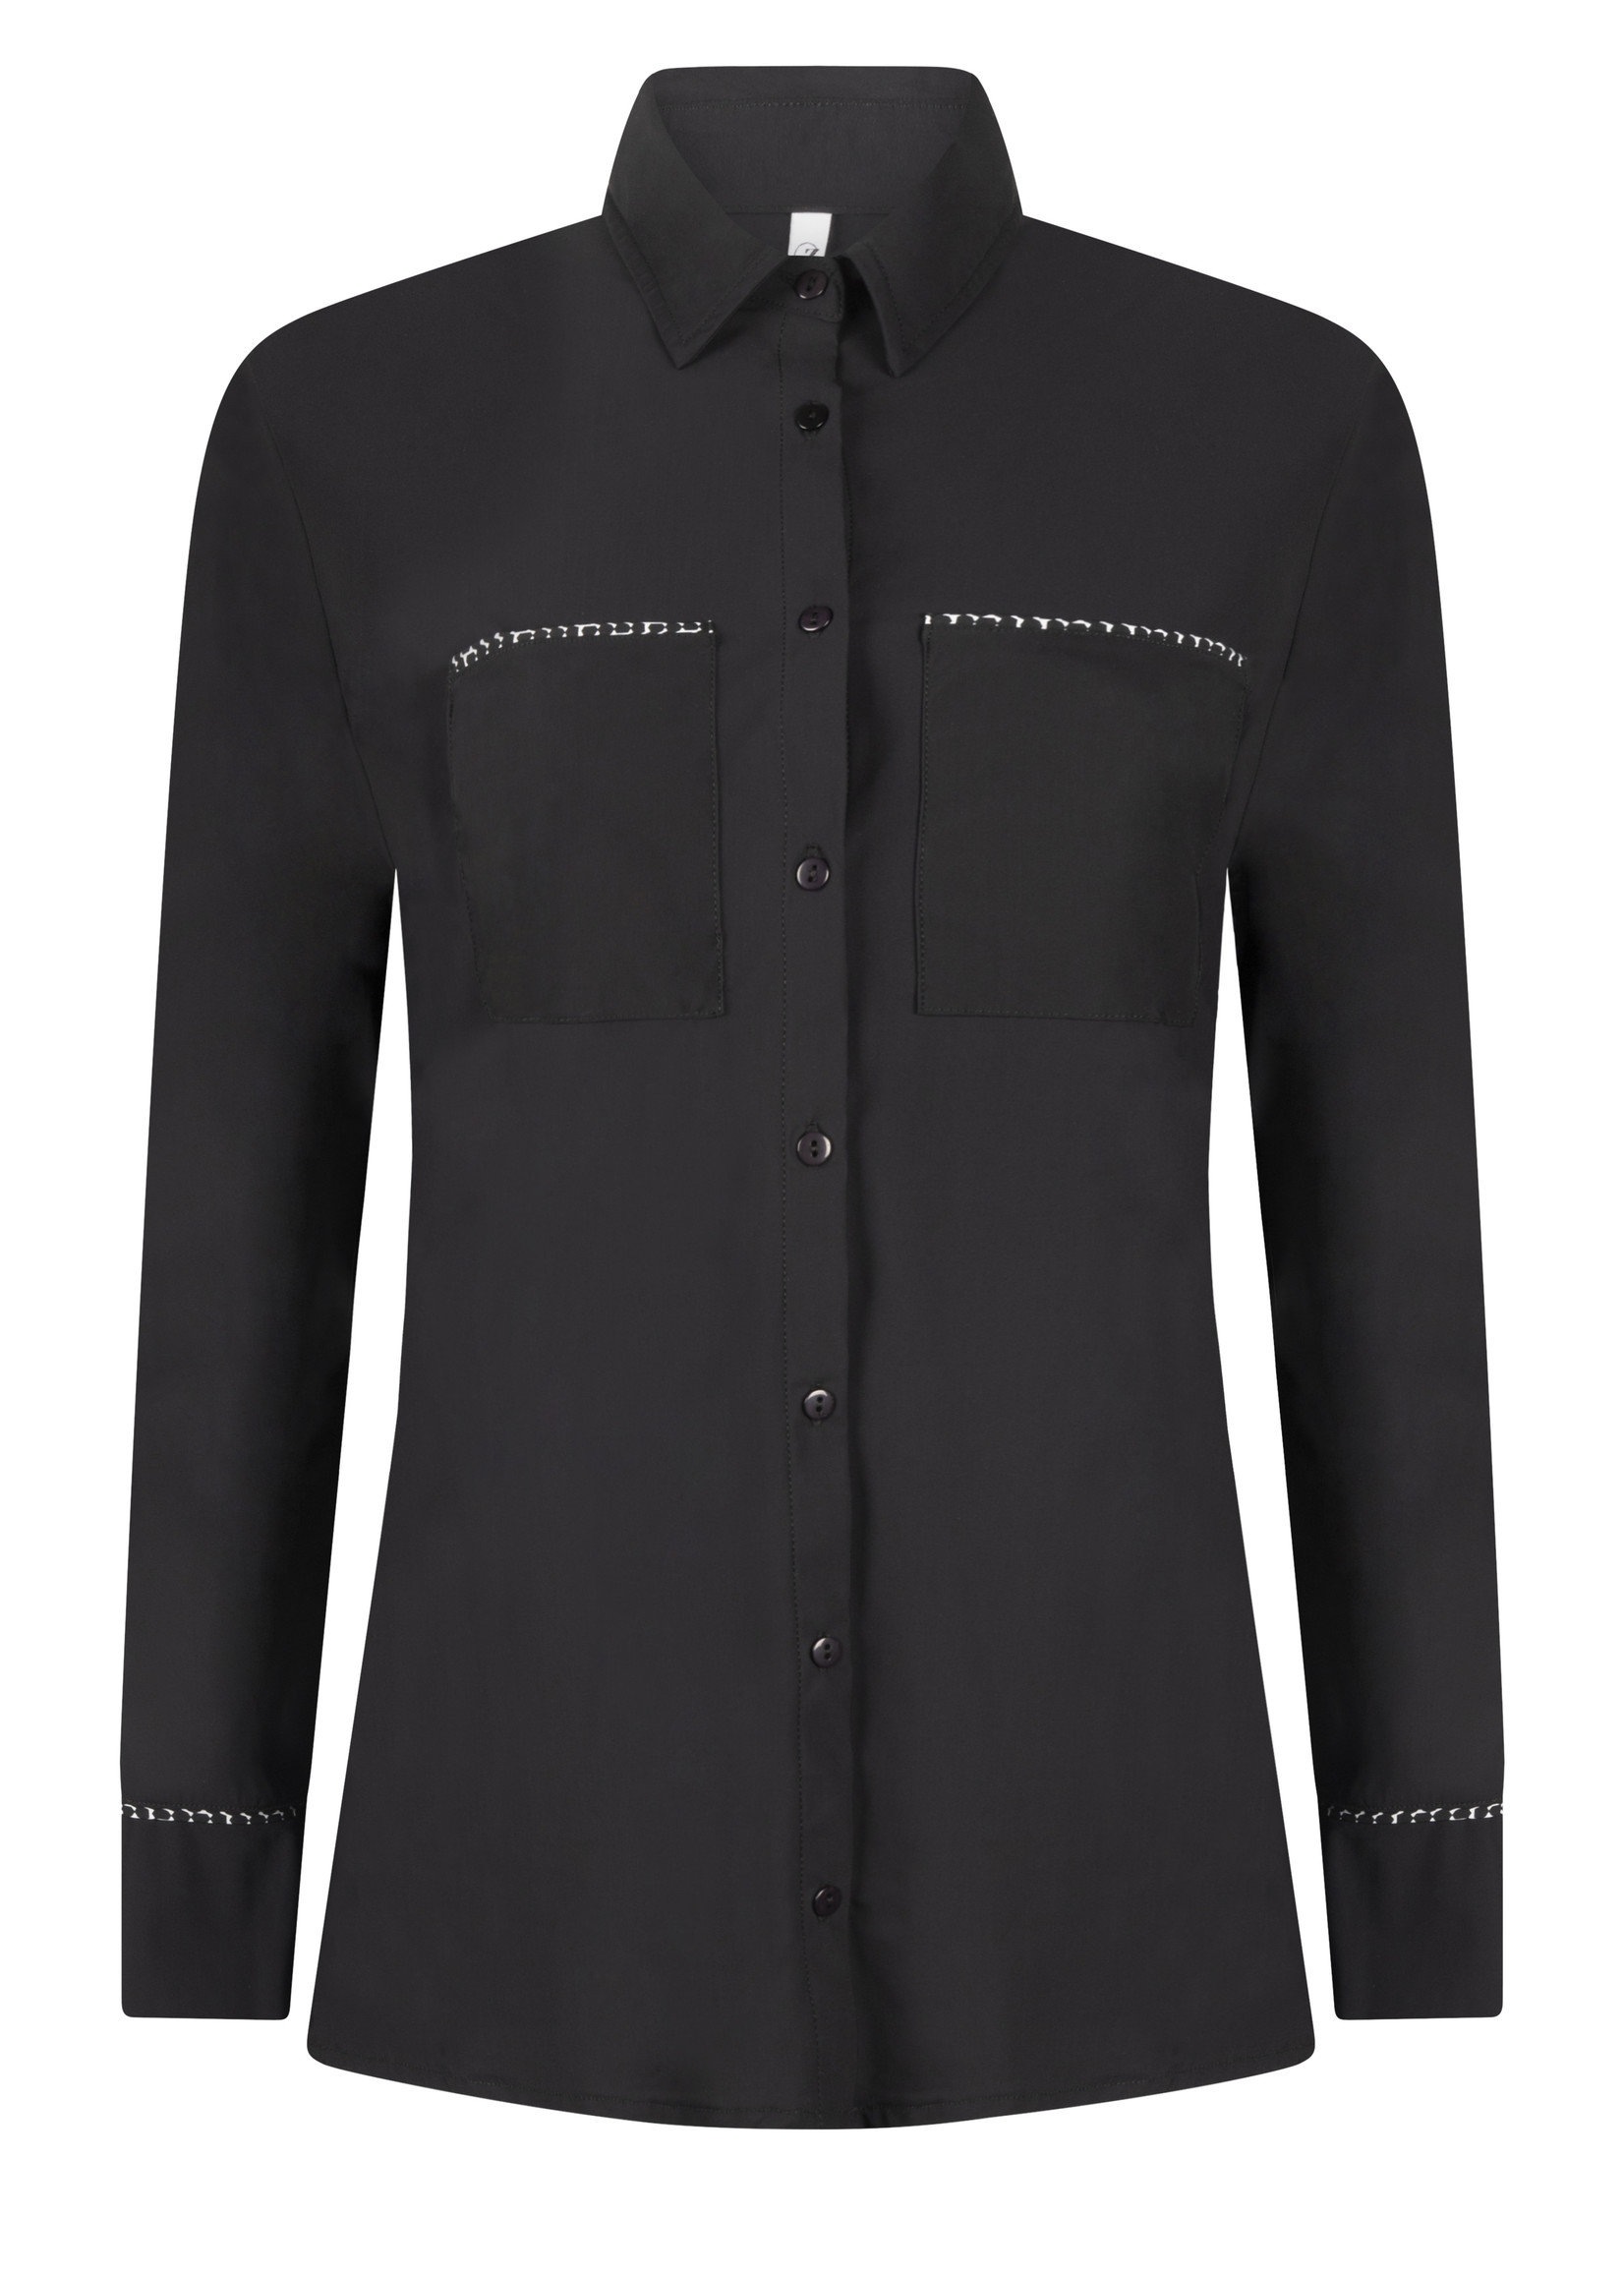 Zoso Zoso - Vera - Travel blouse